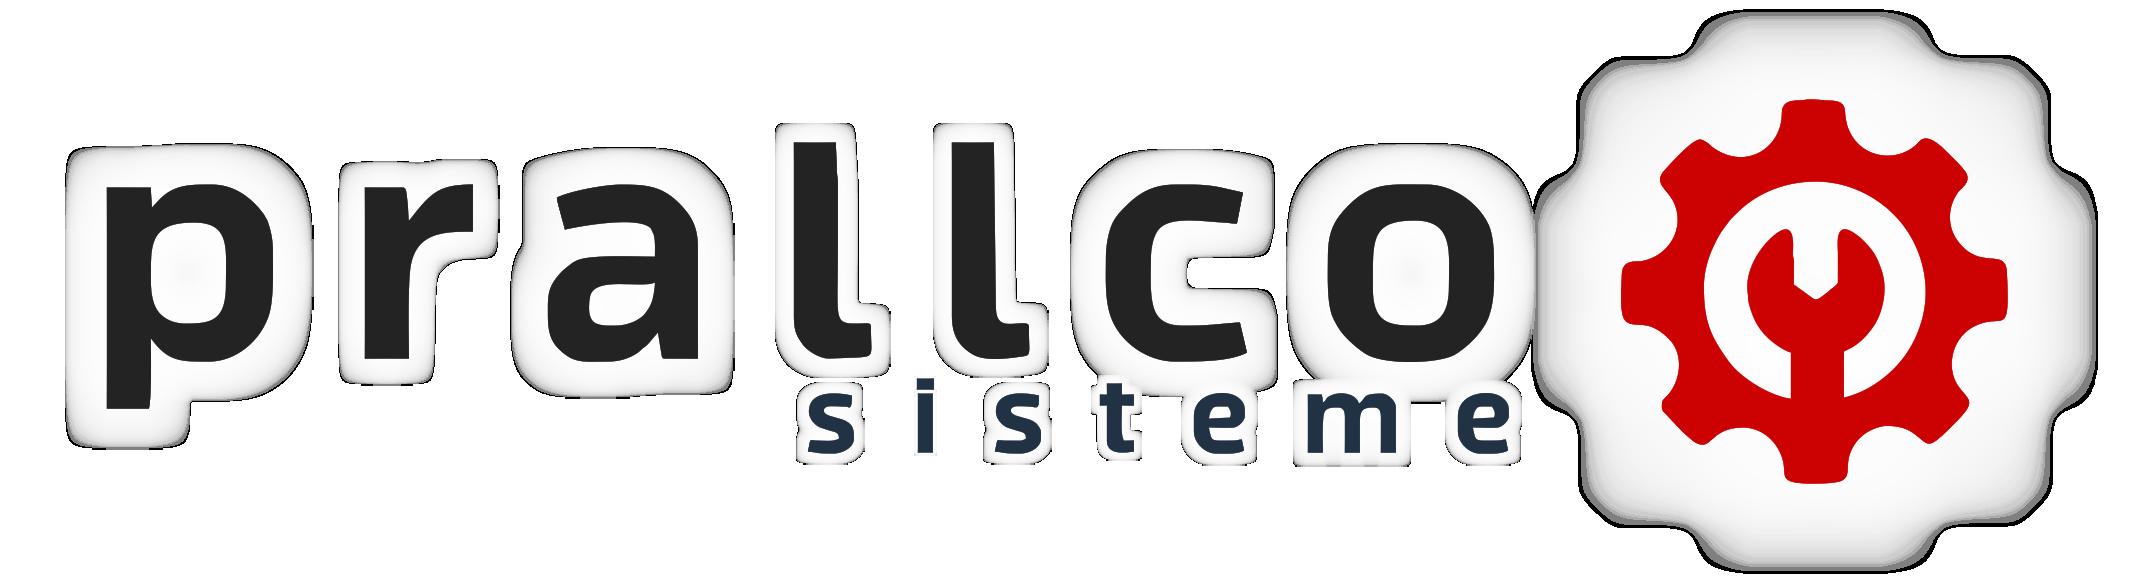 Prallco Sisteme - Mesterul stie cel mai bine